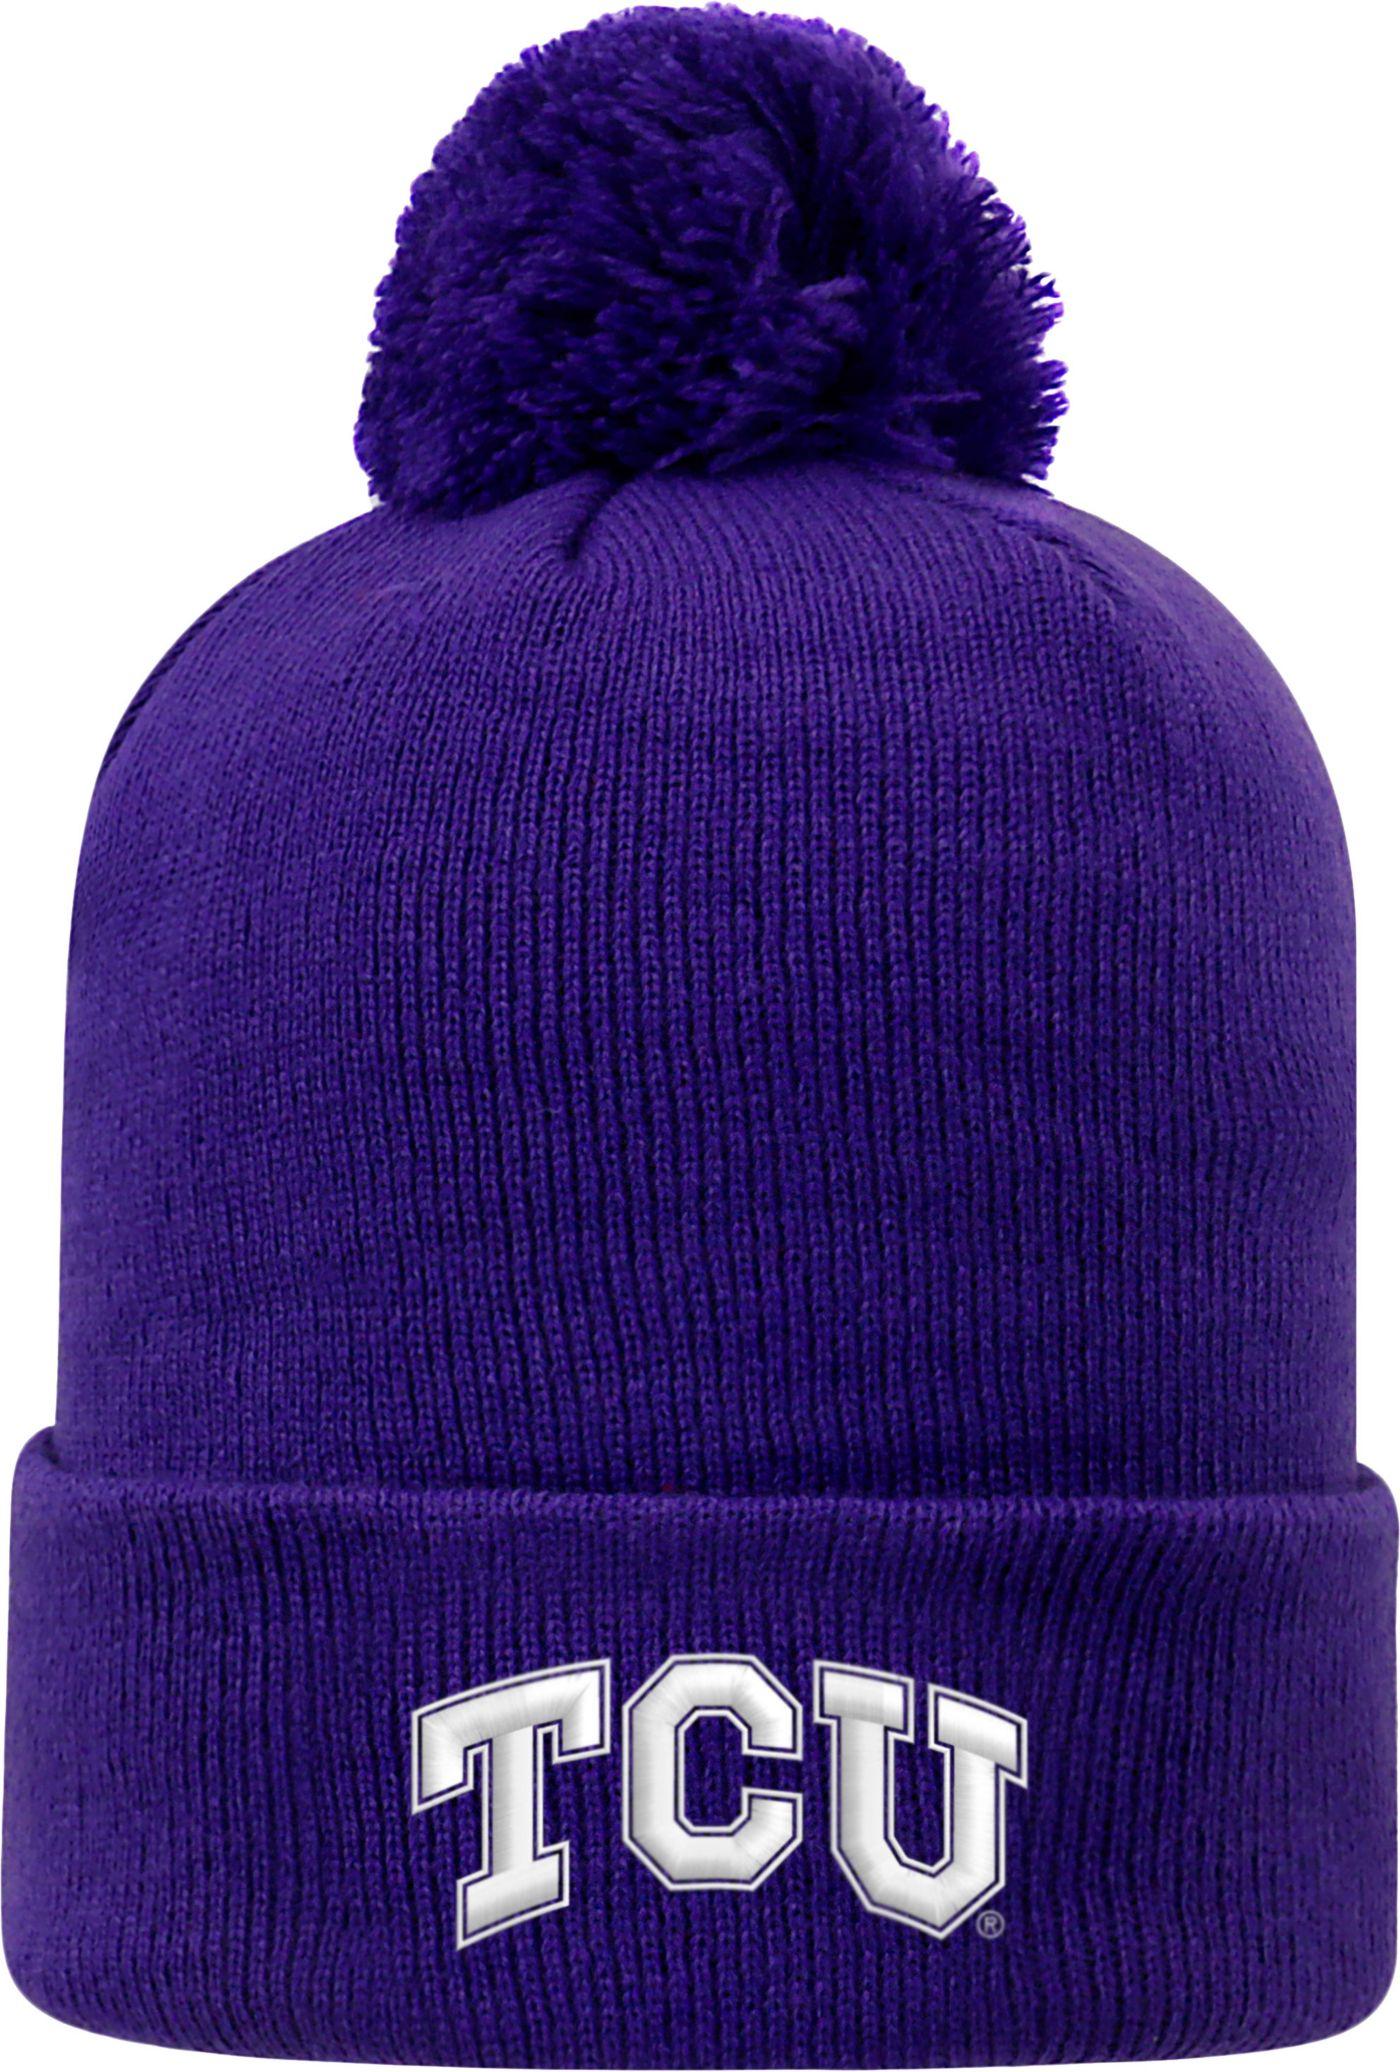 Top of the World Men's TCU Horned Frogs Purple Pom Knit Beanie